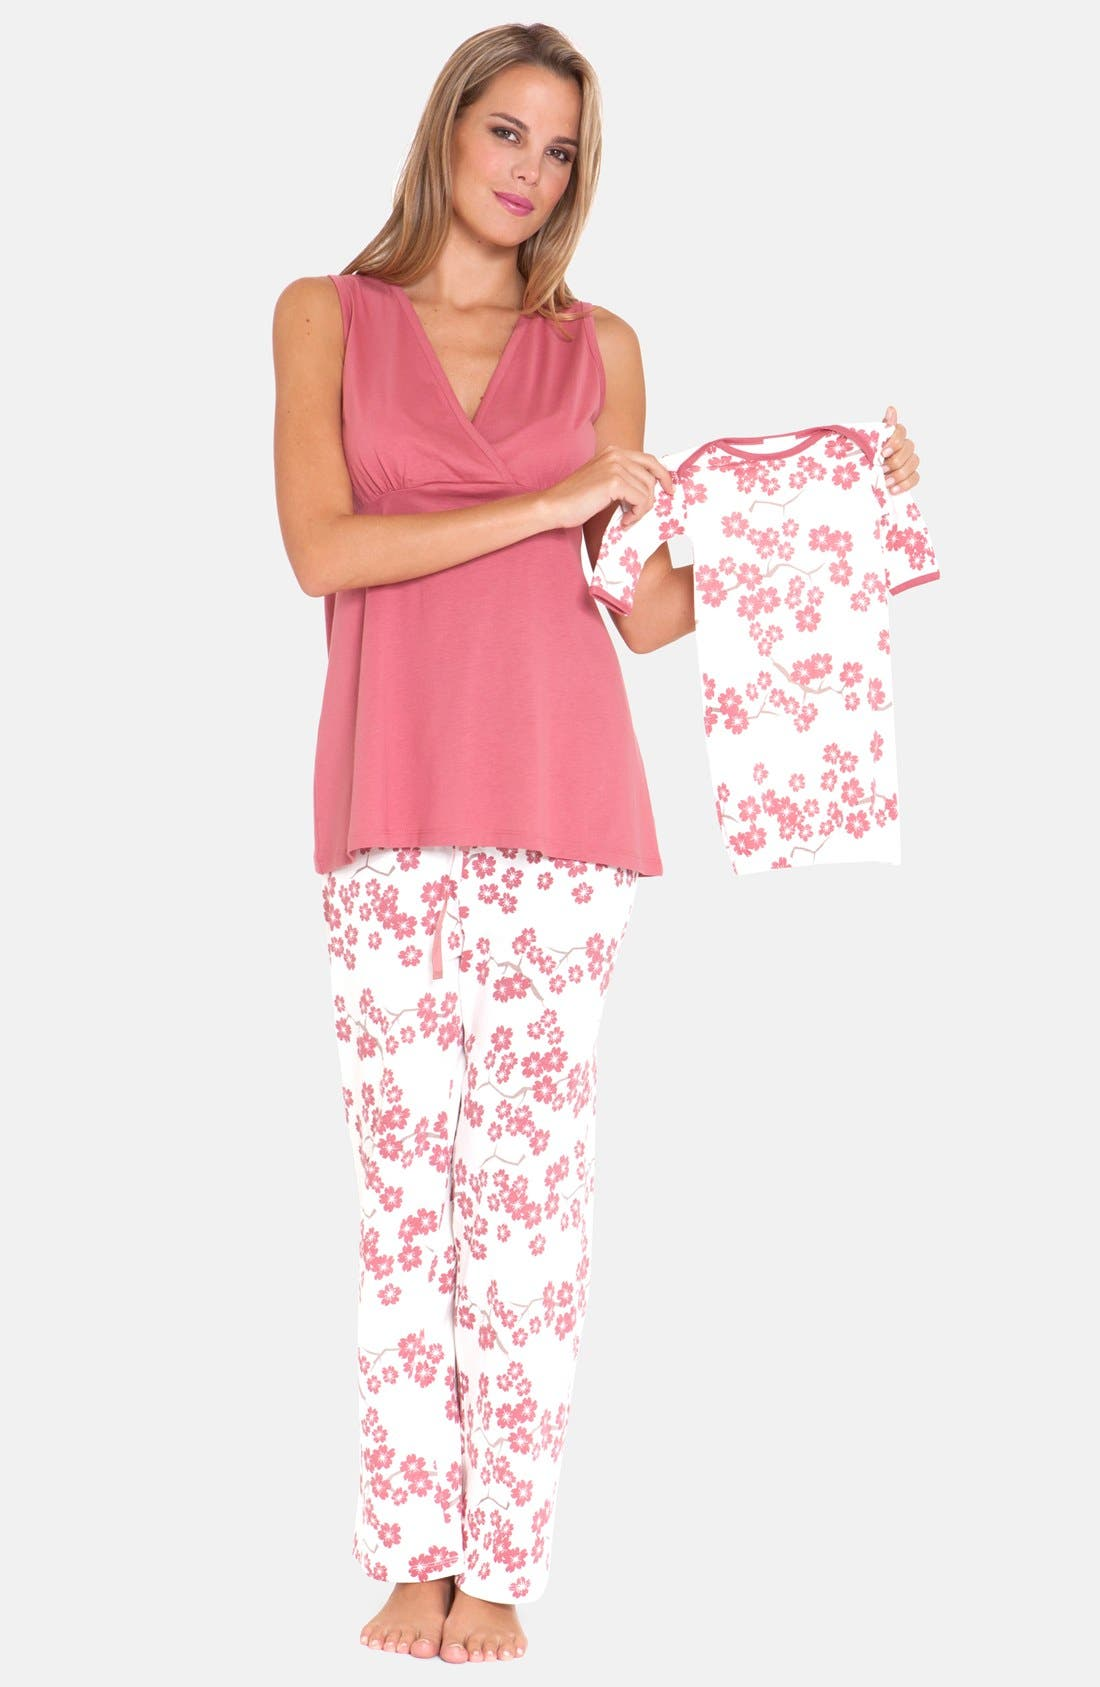 Olian 4-Piece Maternity Sleepwear Gift Set